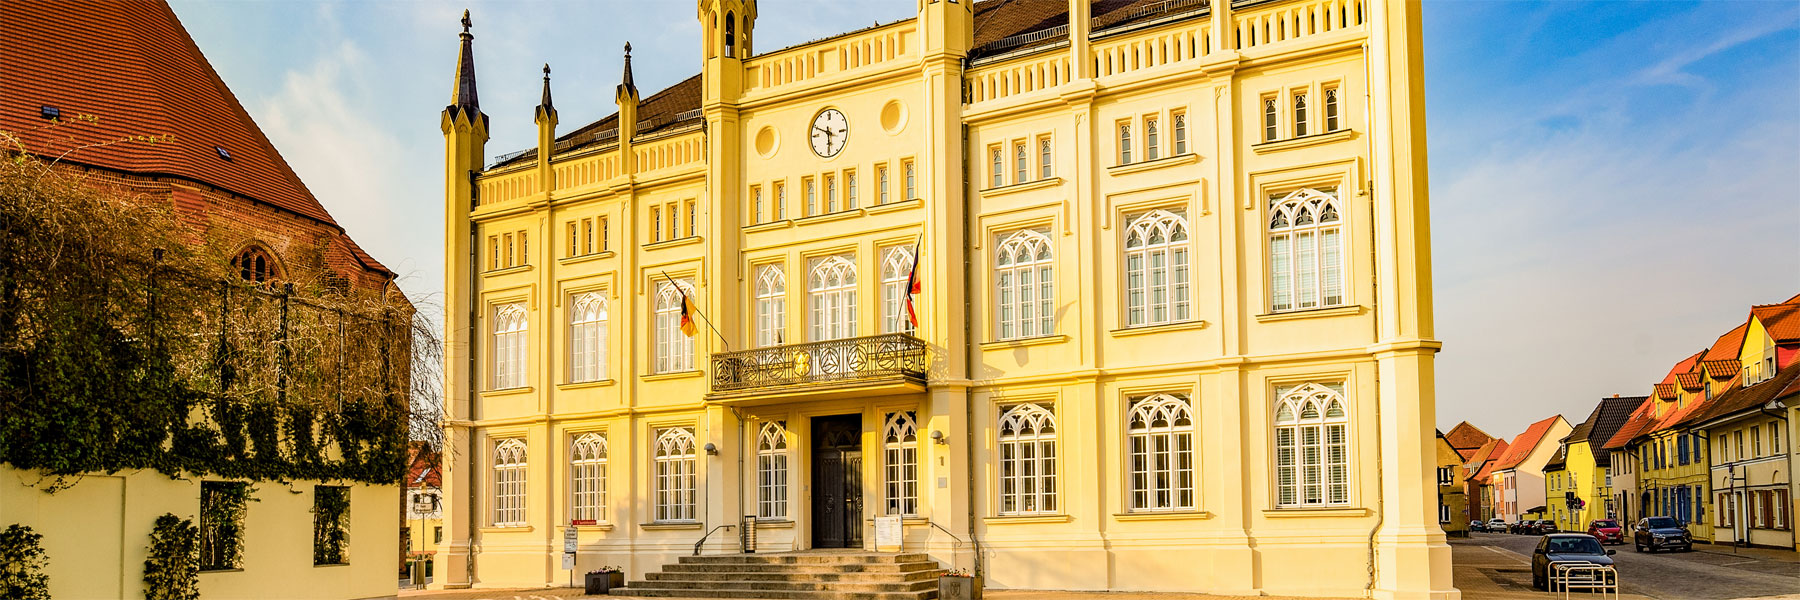 Rathaus - Stadt Bützow